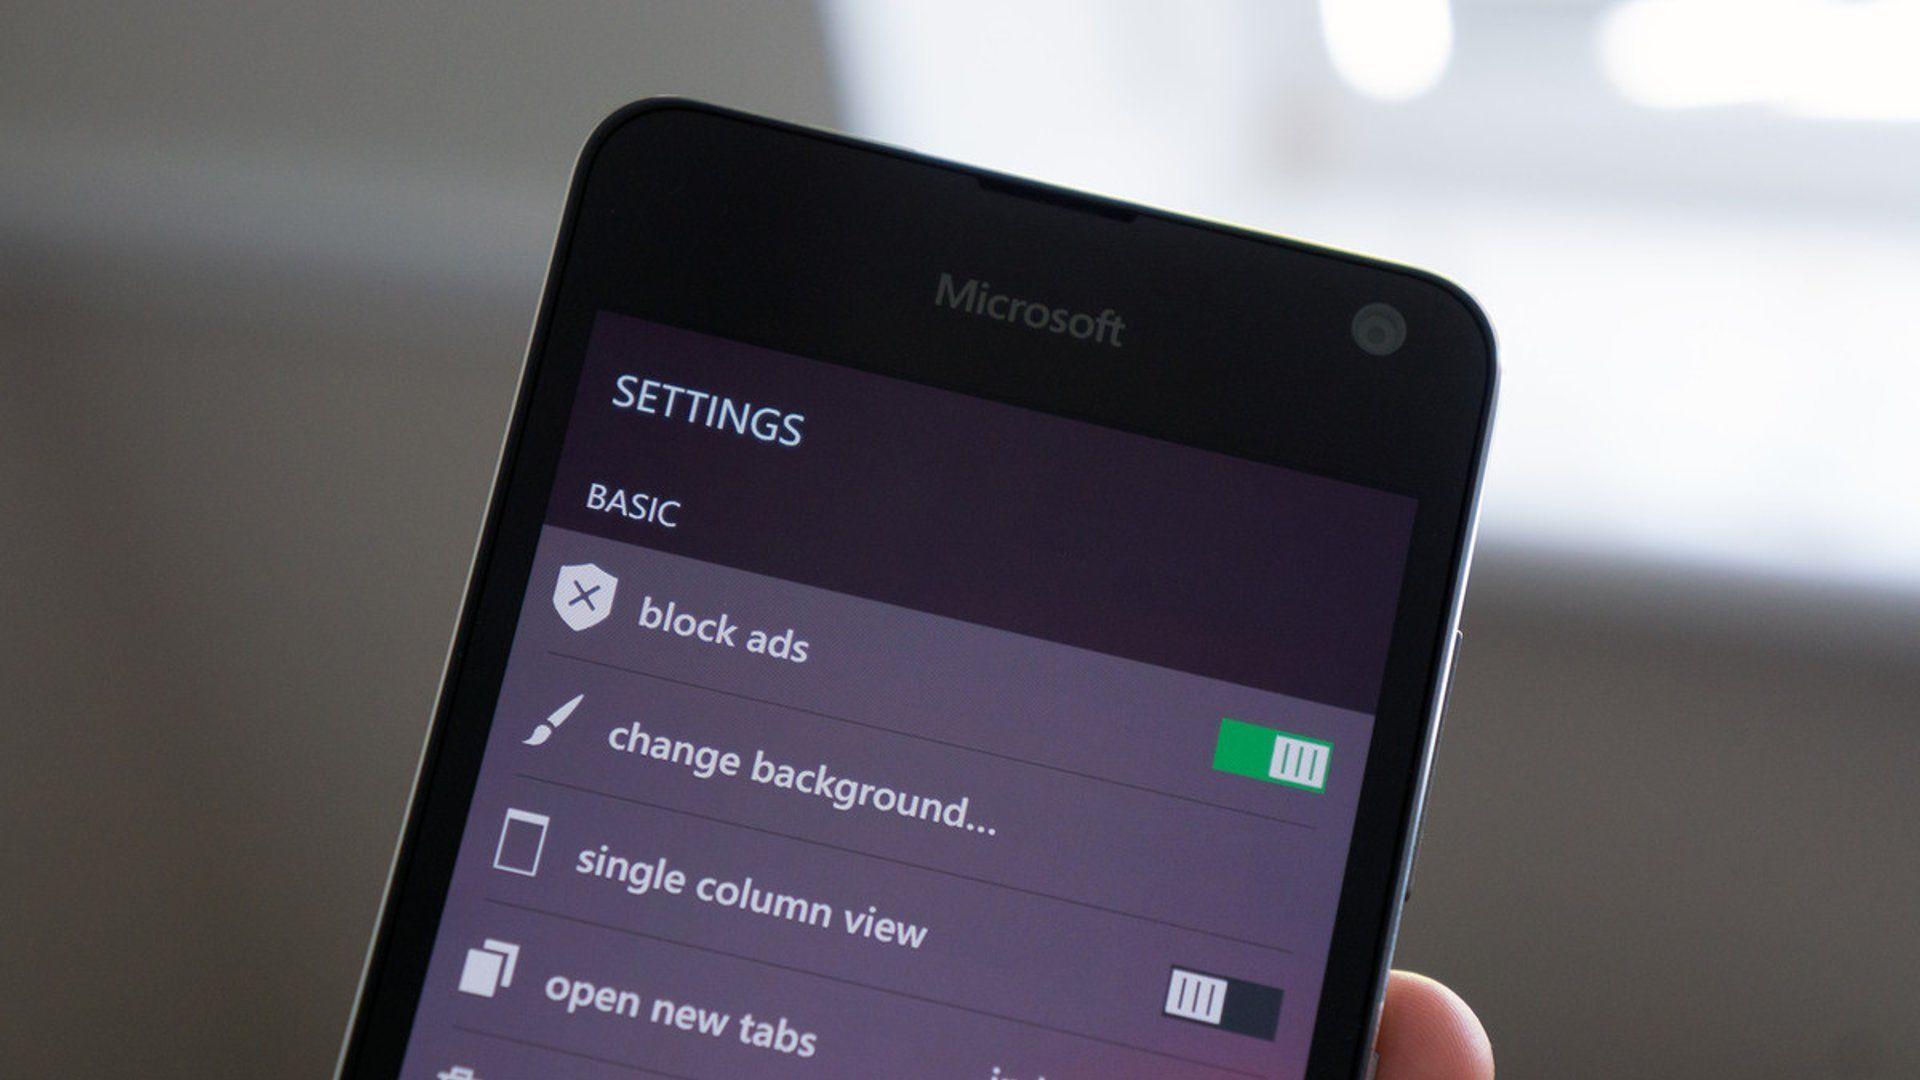 Opera Mini Brings Ad Block Feature To Windows 10 Mobile